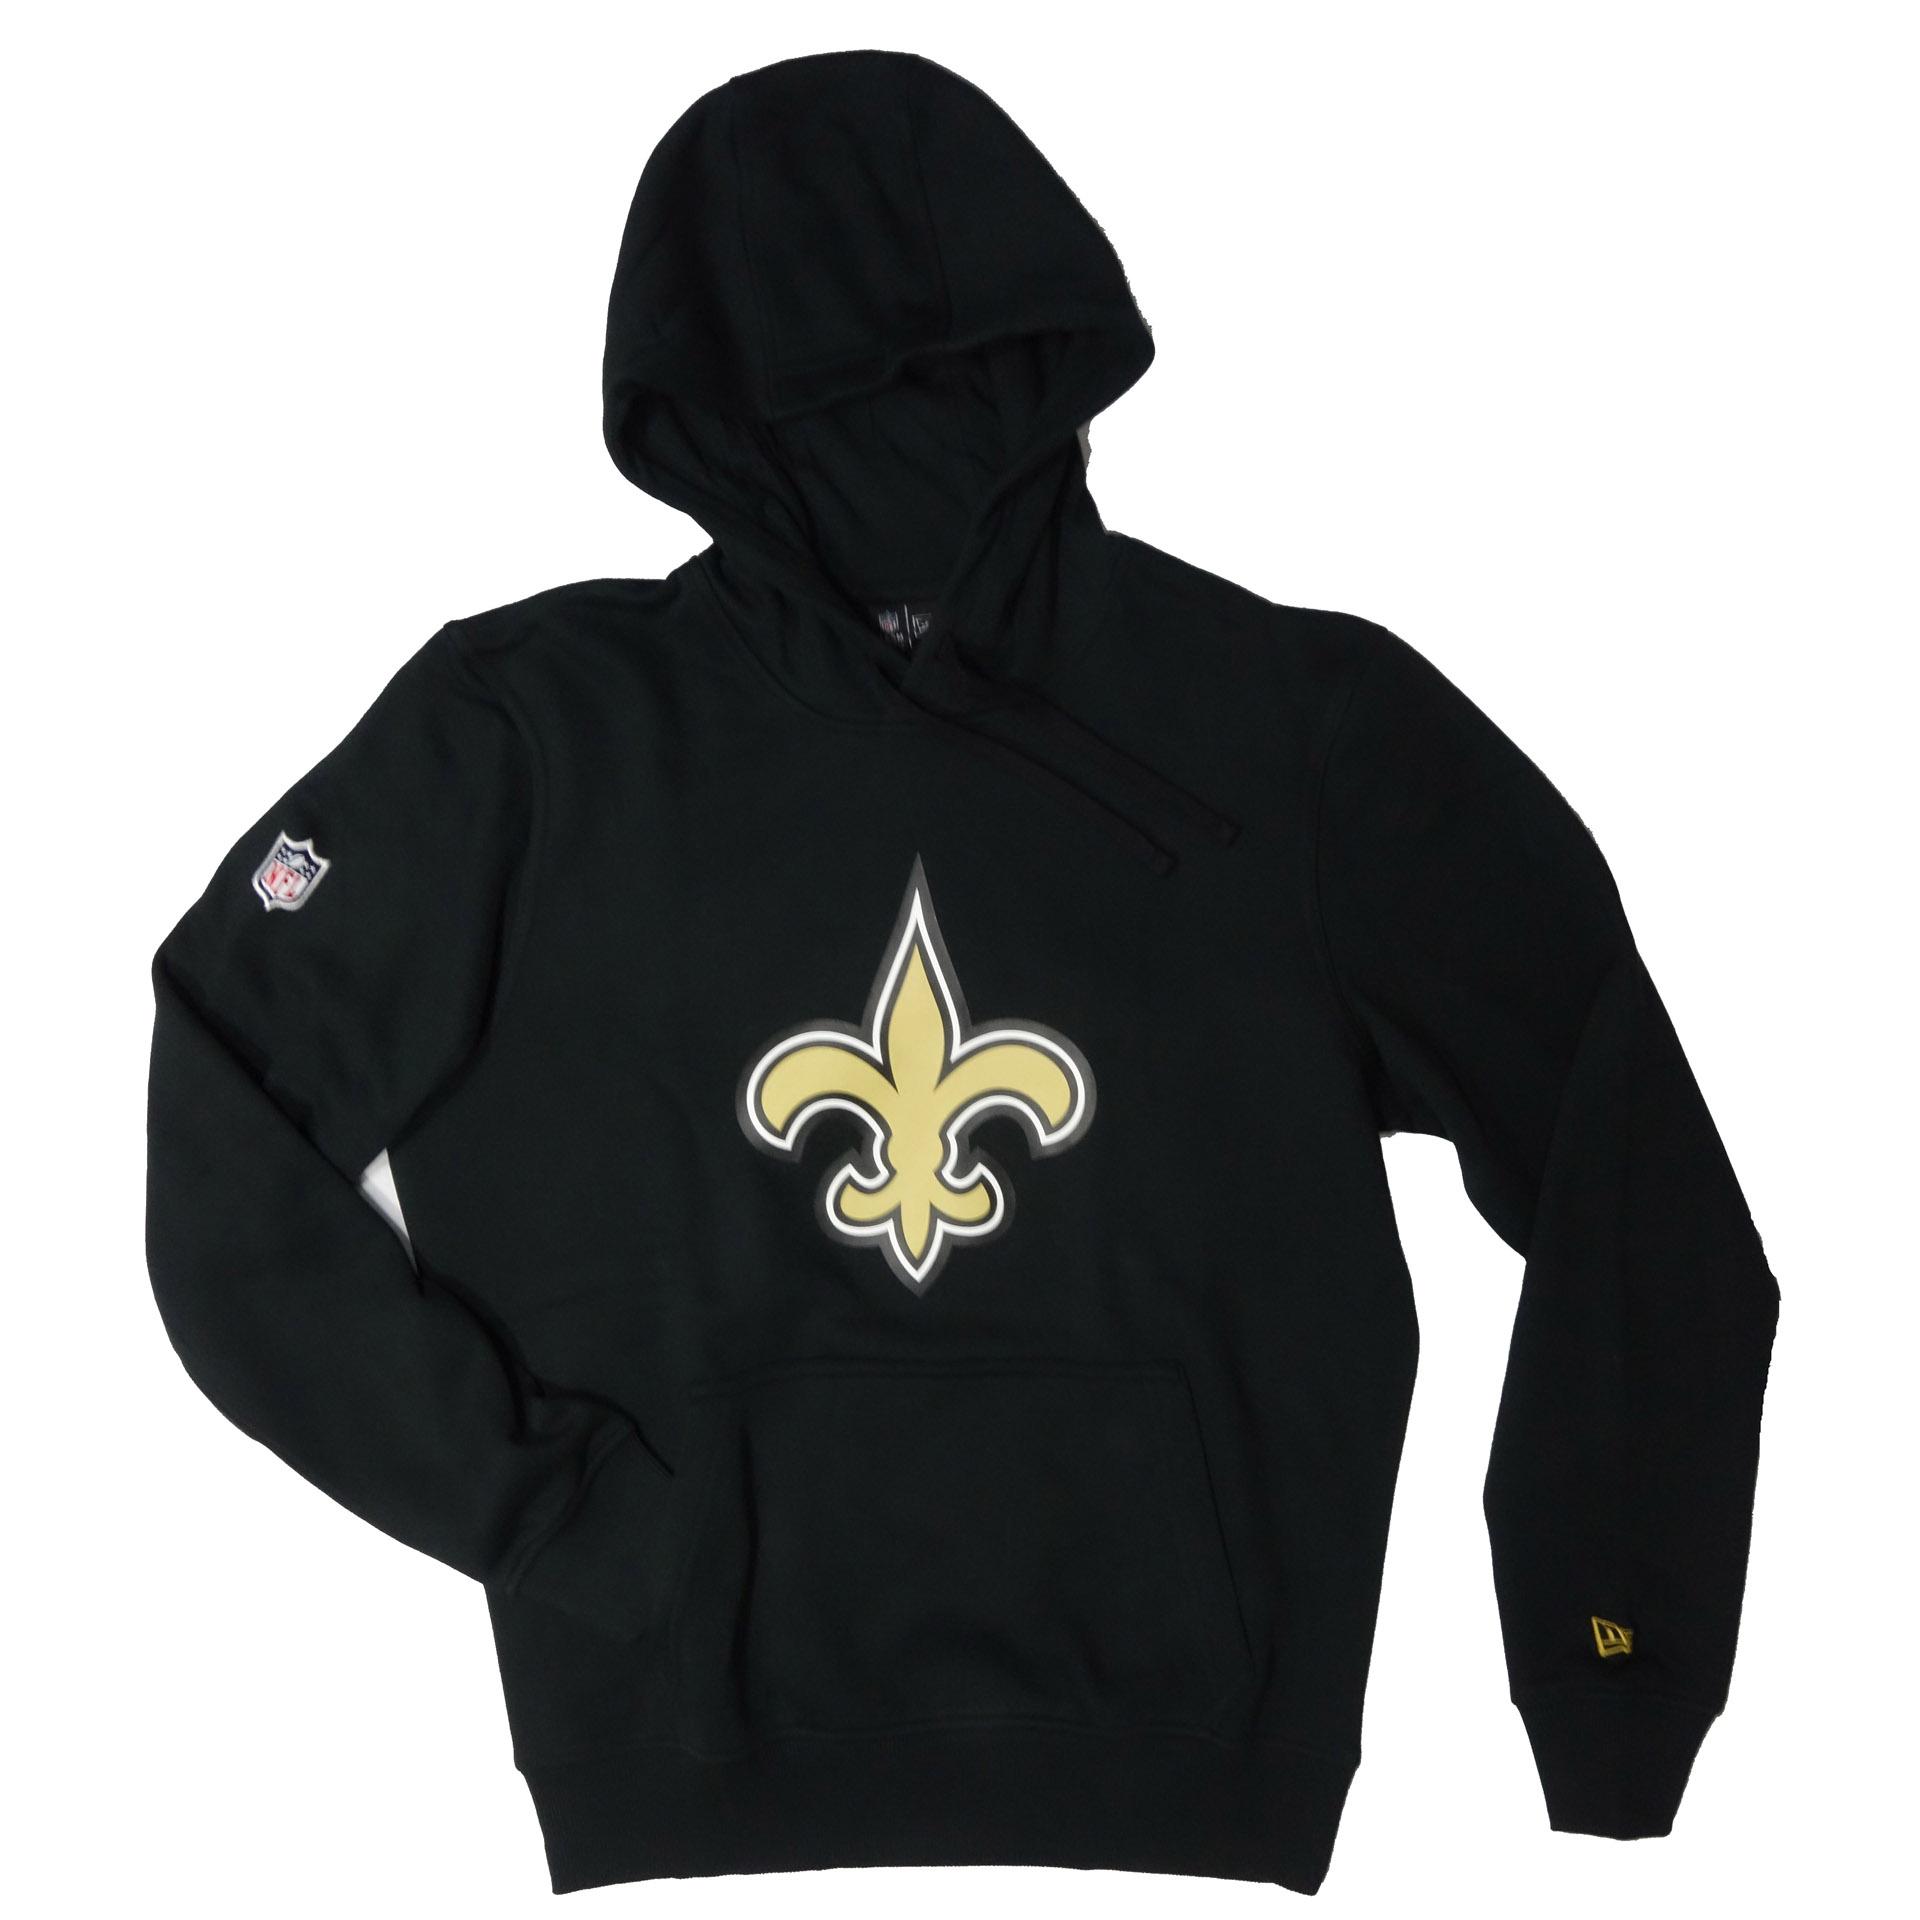 NFL New Era Hoodie New Orleans Saints